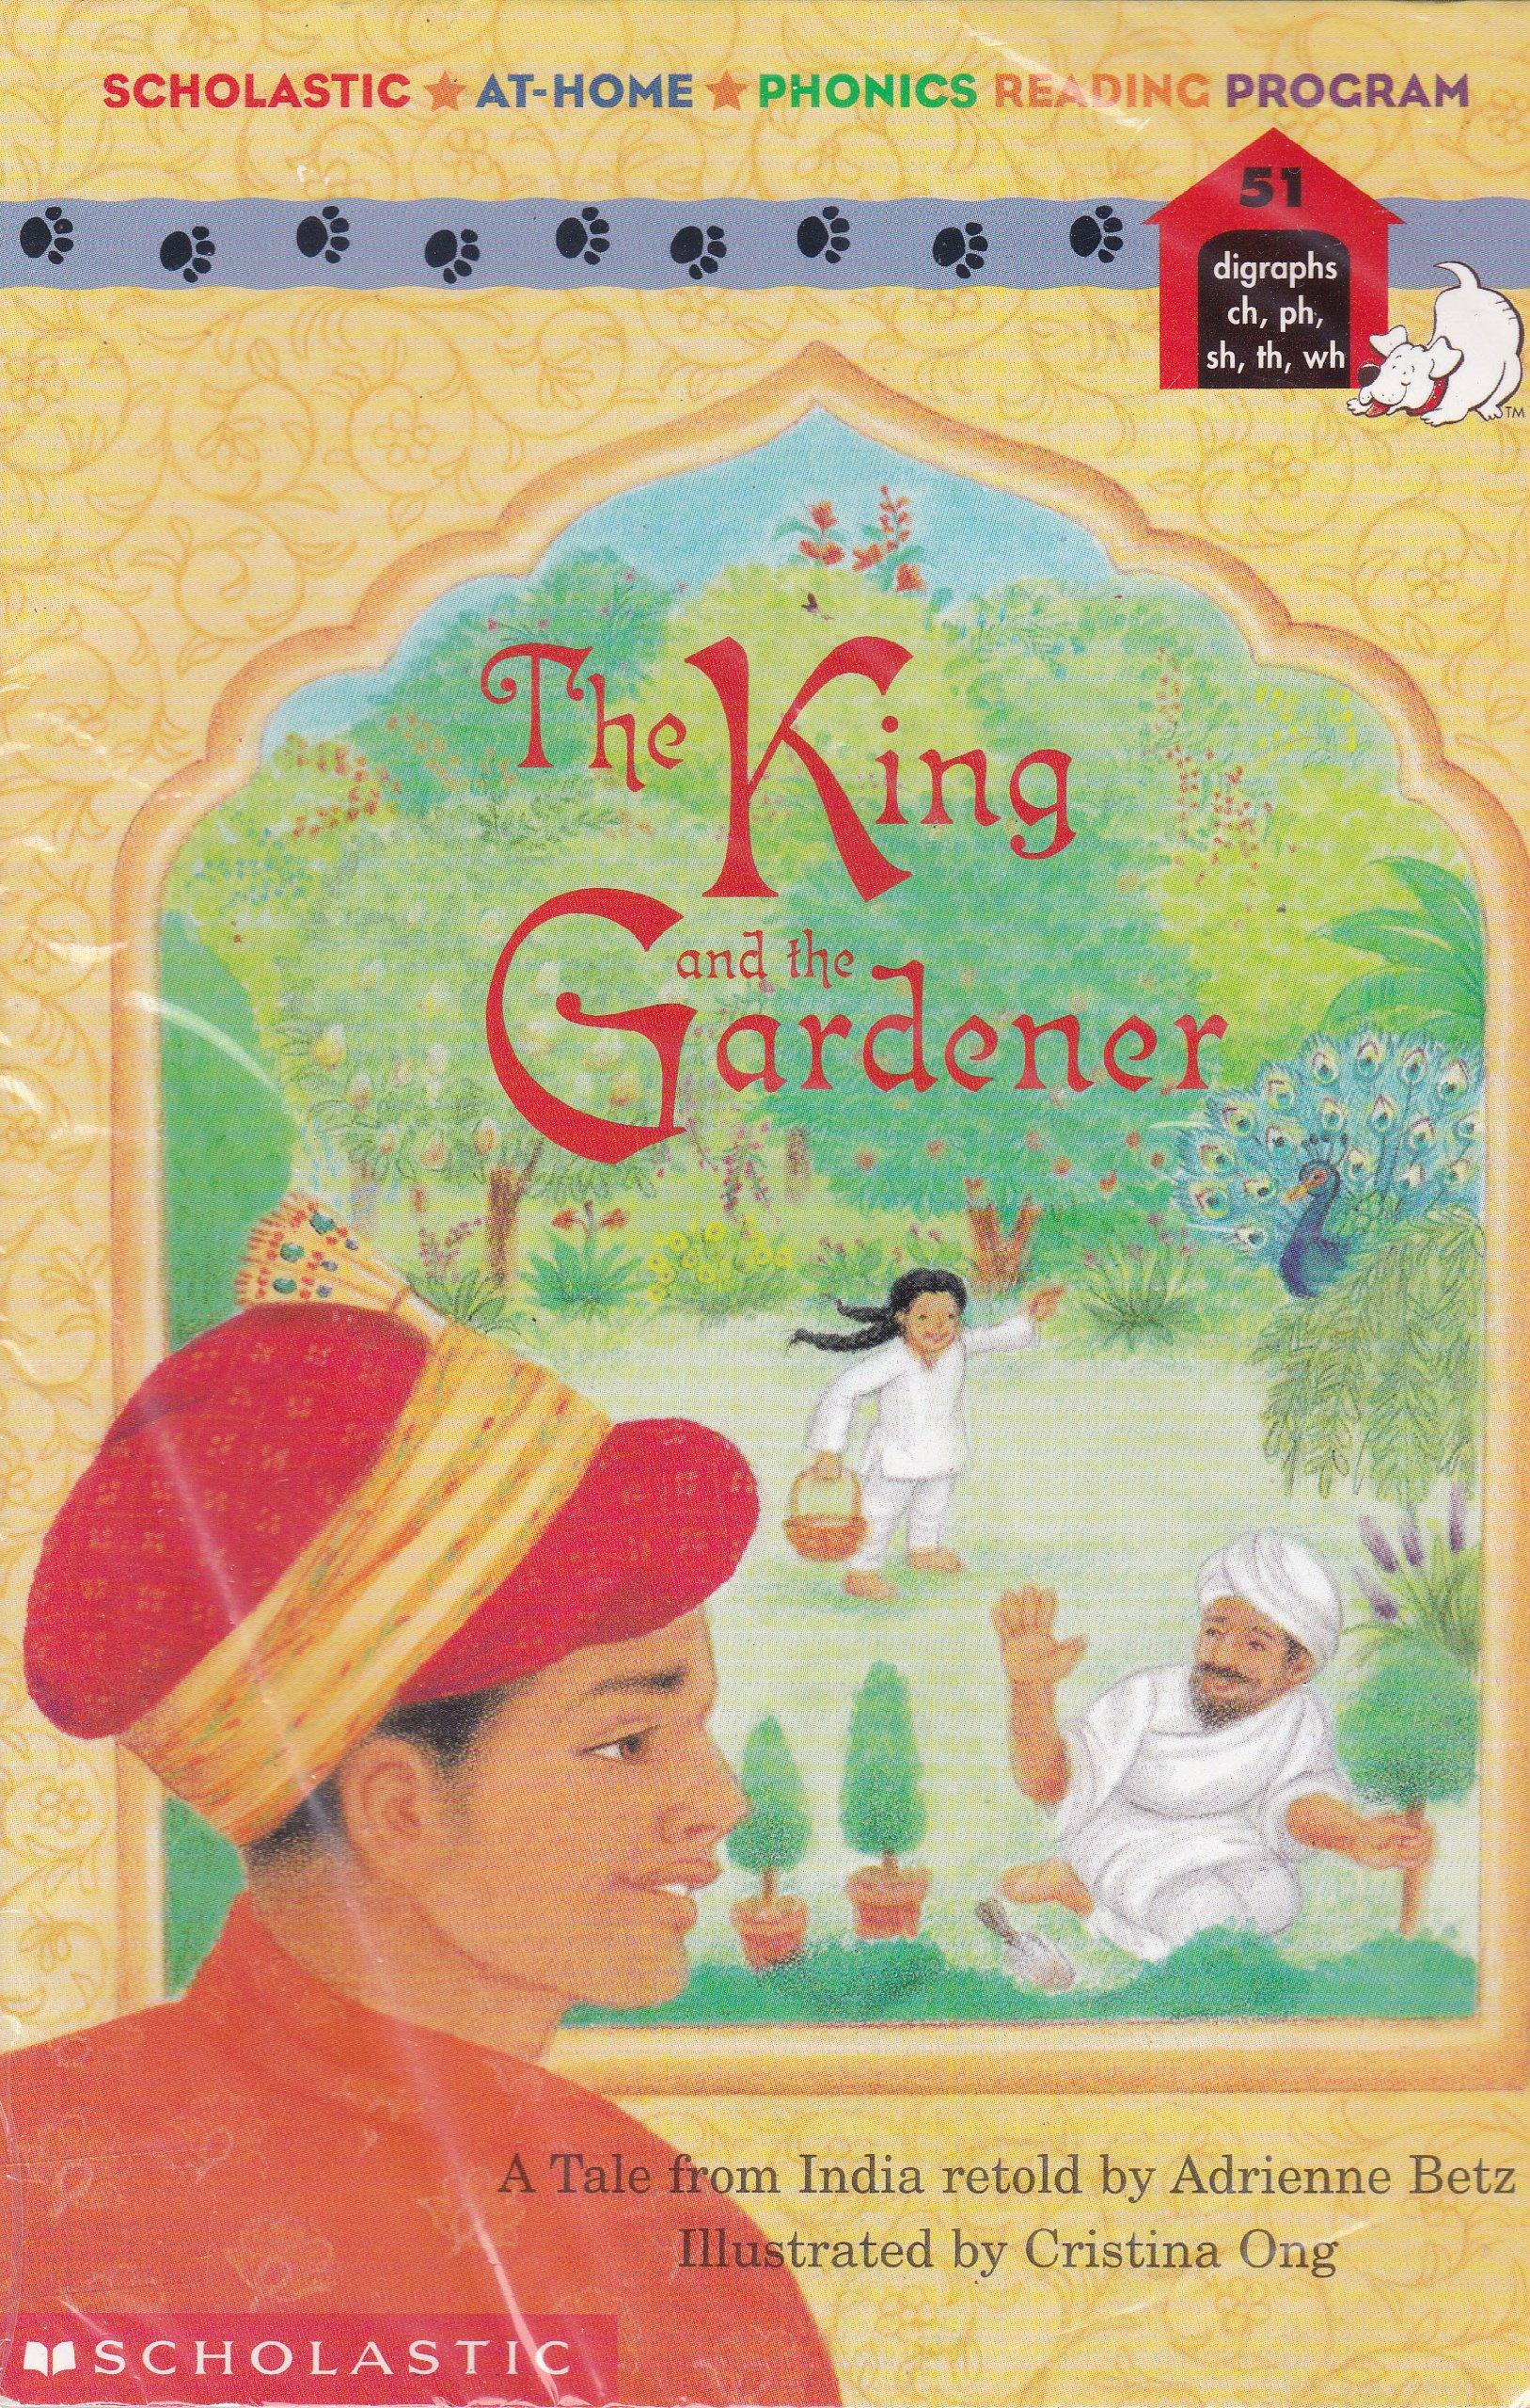 The King and the Gardener (Scholastic At-Home Phonics Reading Program, 51) pdf epub